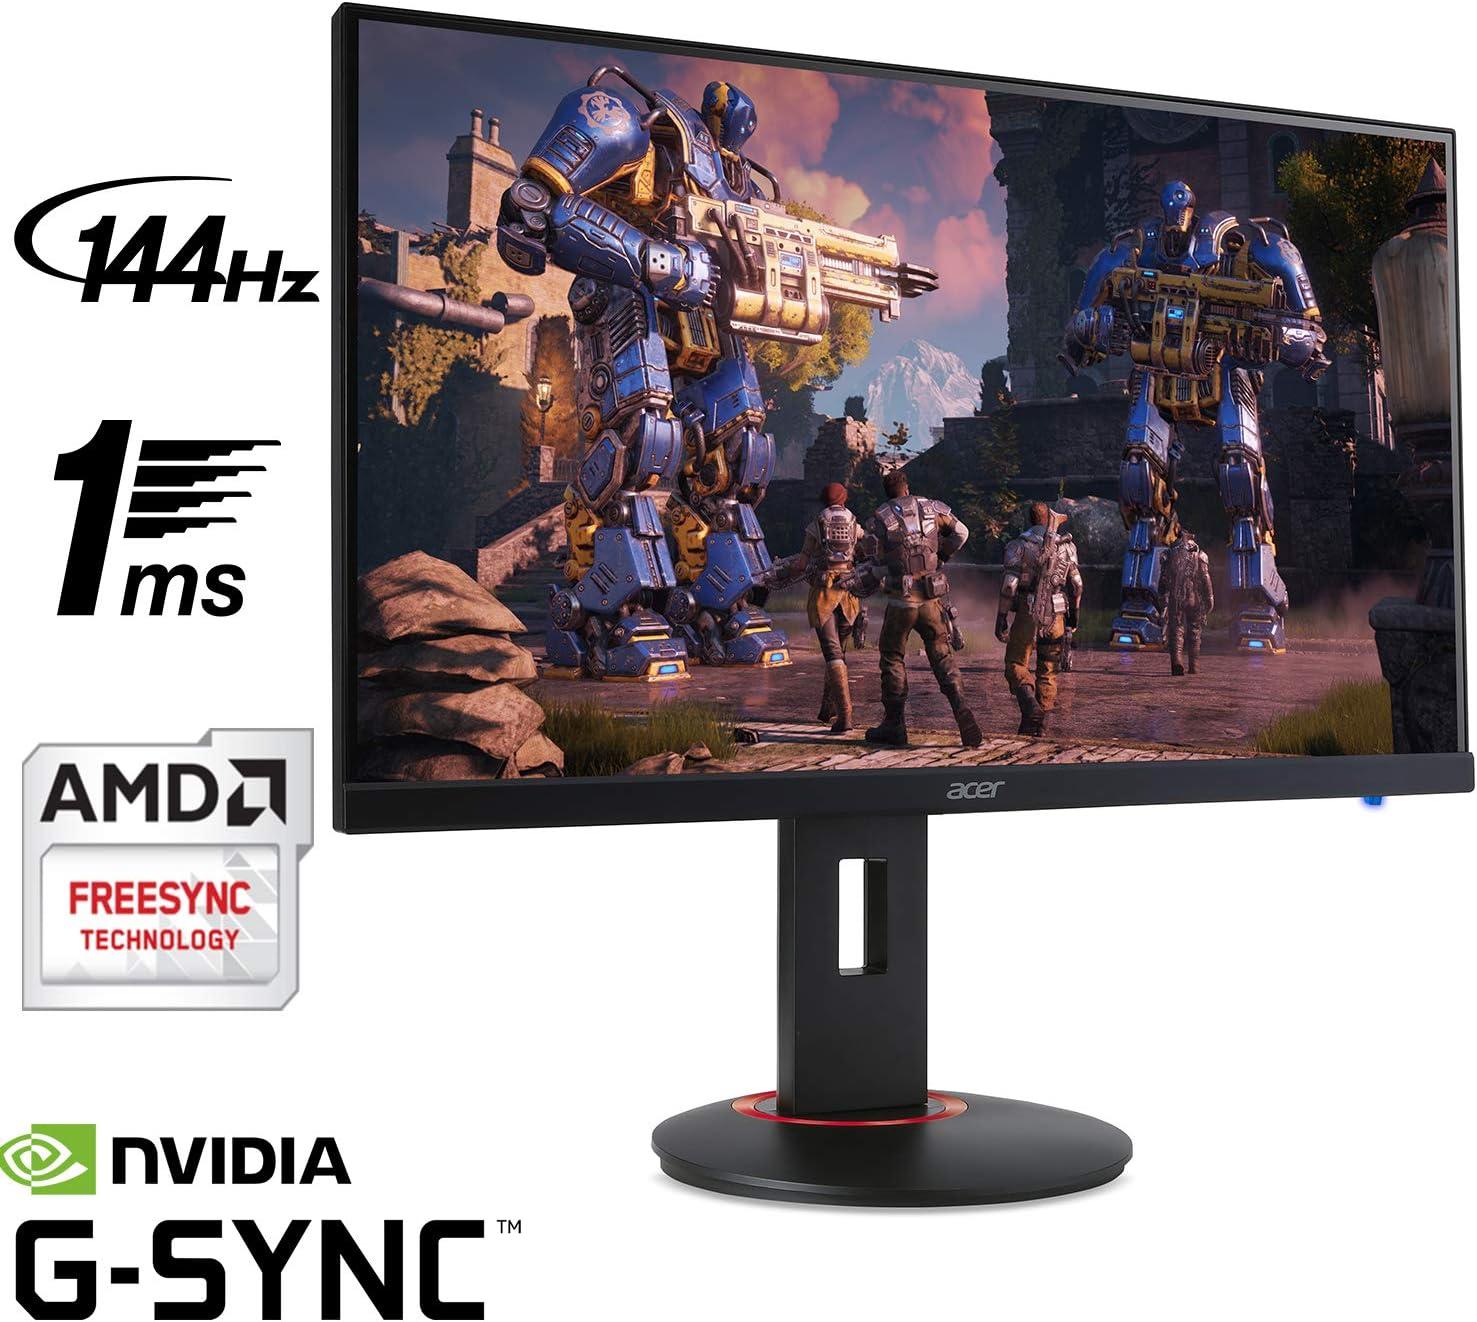 Amazon.com: Acer XF270H Bbmiiprx Monitor para juegos Full HD de 27 pulgadas  (1920 x 1080) Zero Frame TN AMD FreeSync y NVIDIA G-SYNC compatible - 1 ms    144 Hz Refresh (puerto